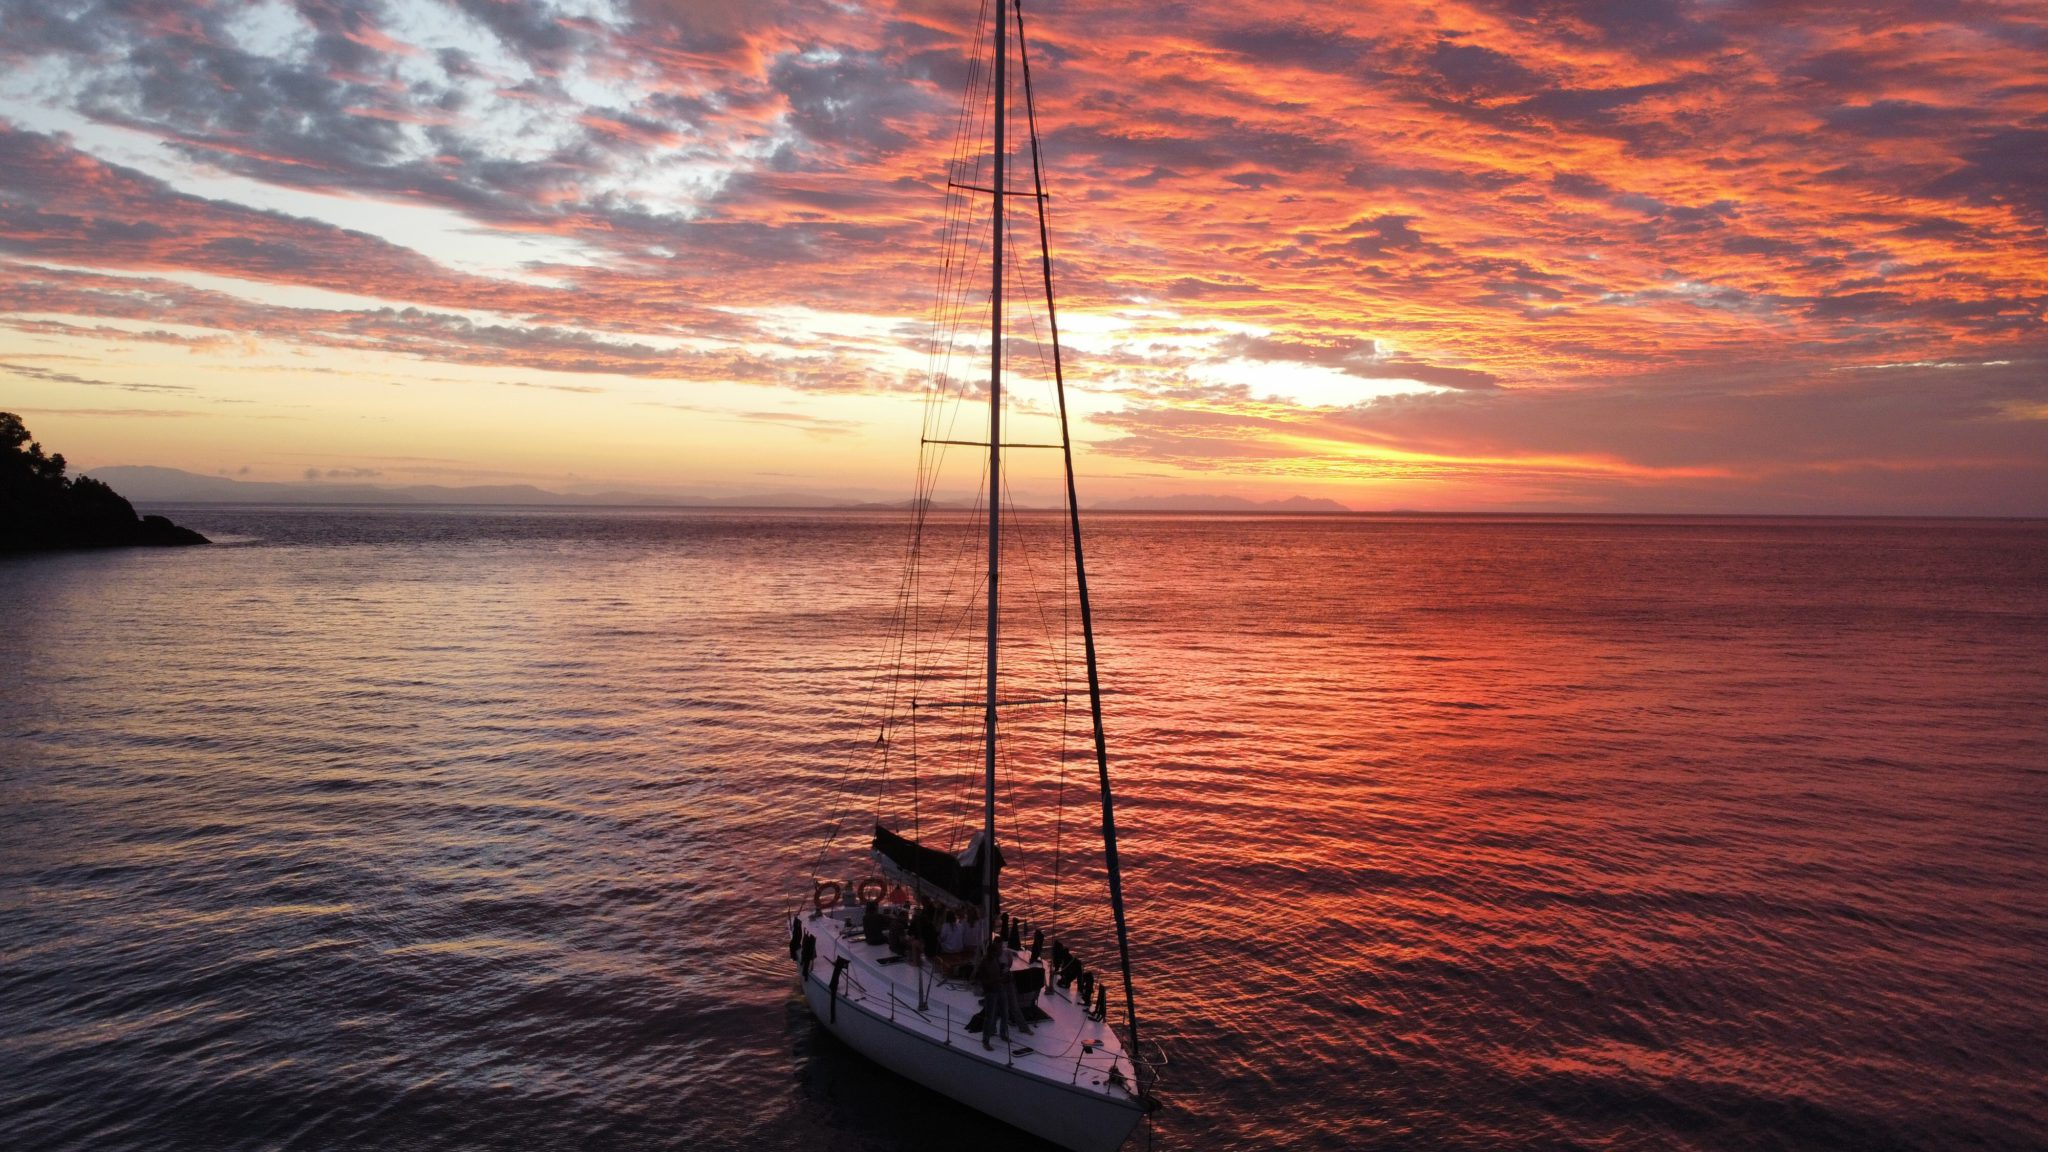 Mandrake Whitsundays Sailing Adventure in Queensland